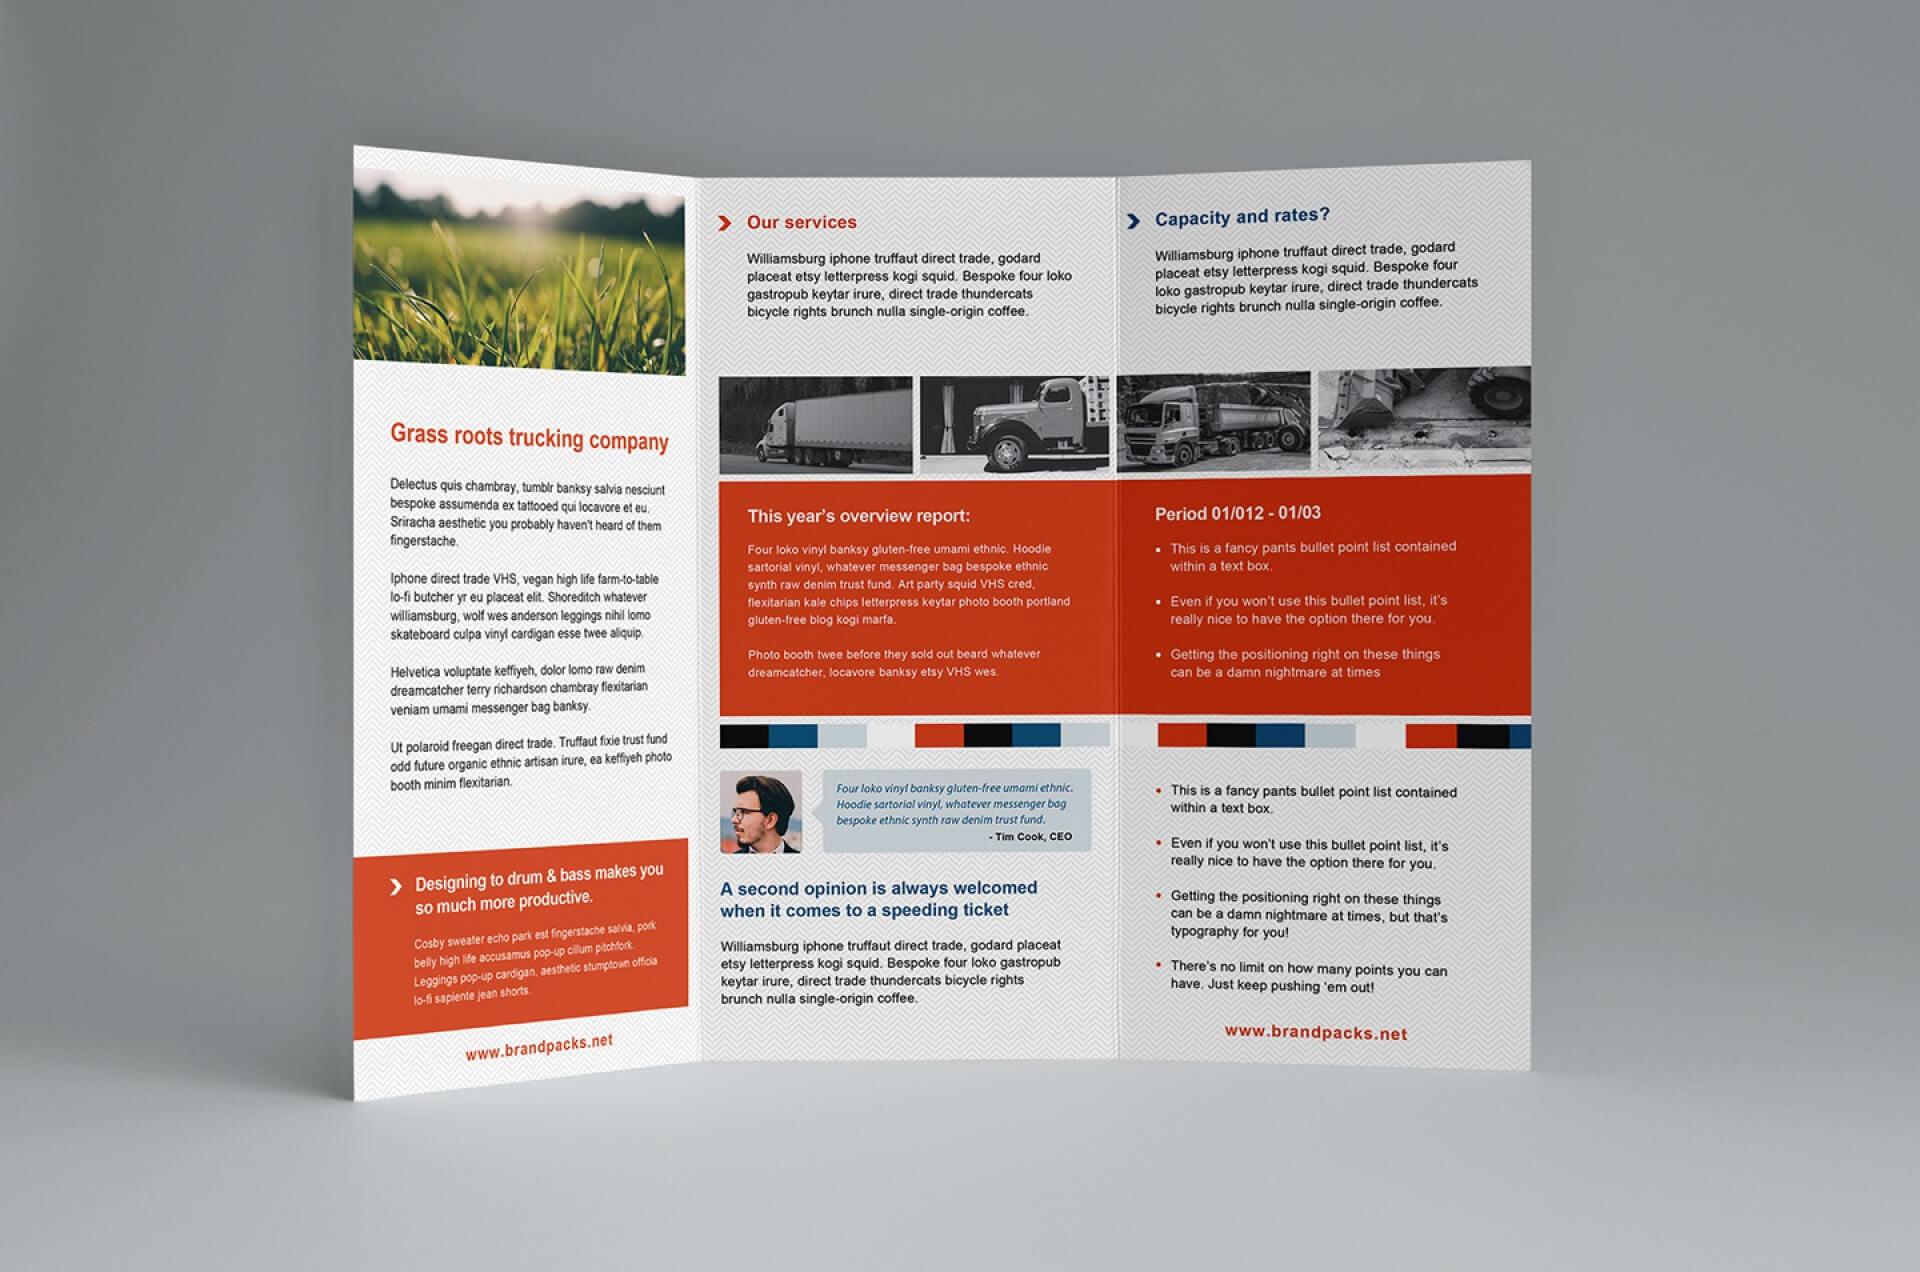 032 Tri Fold Brochure Template Free Download Ai 1024W F Pertaining To Adobe Illustrator Tri Fold Brochure Template